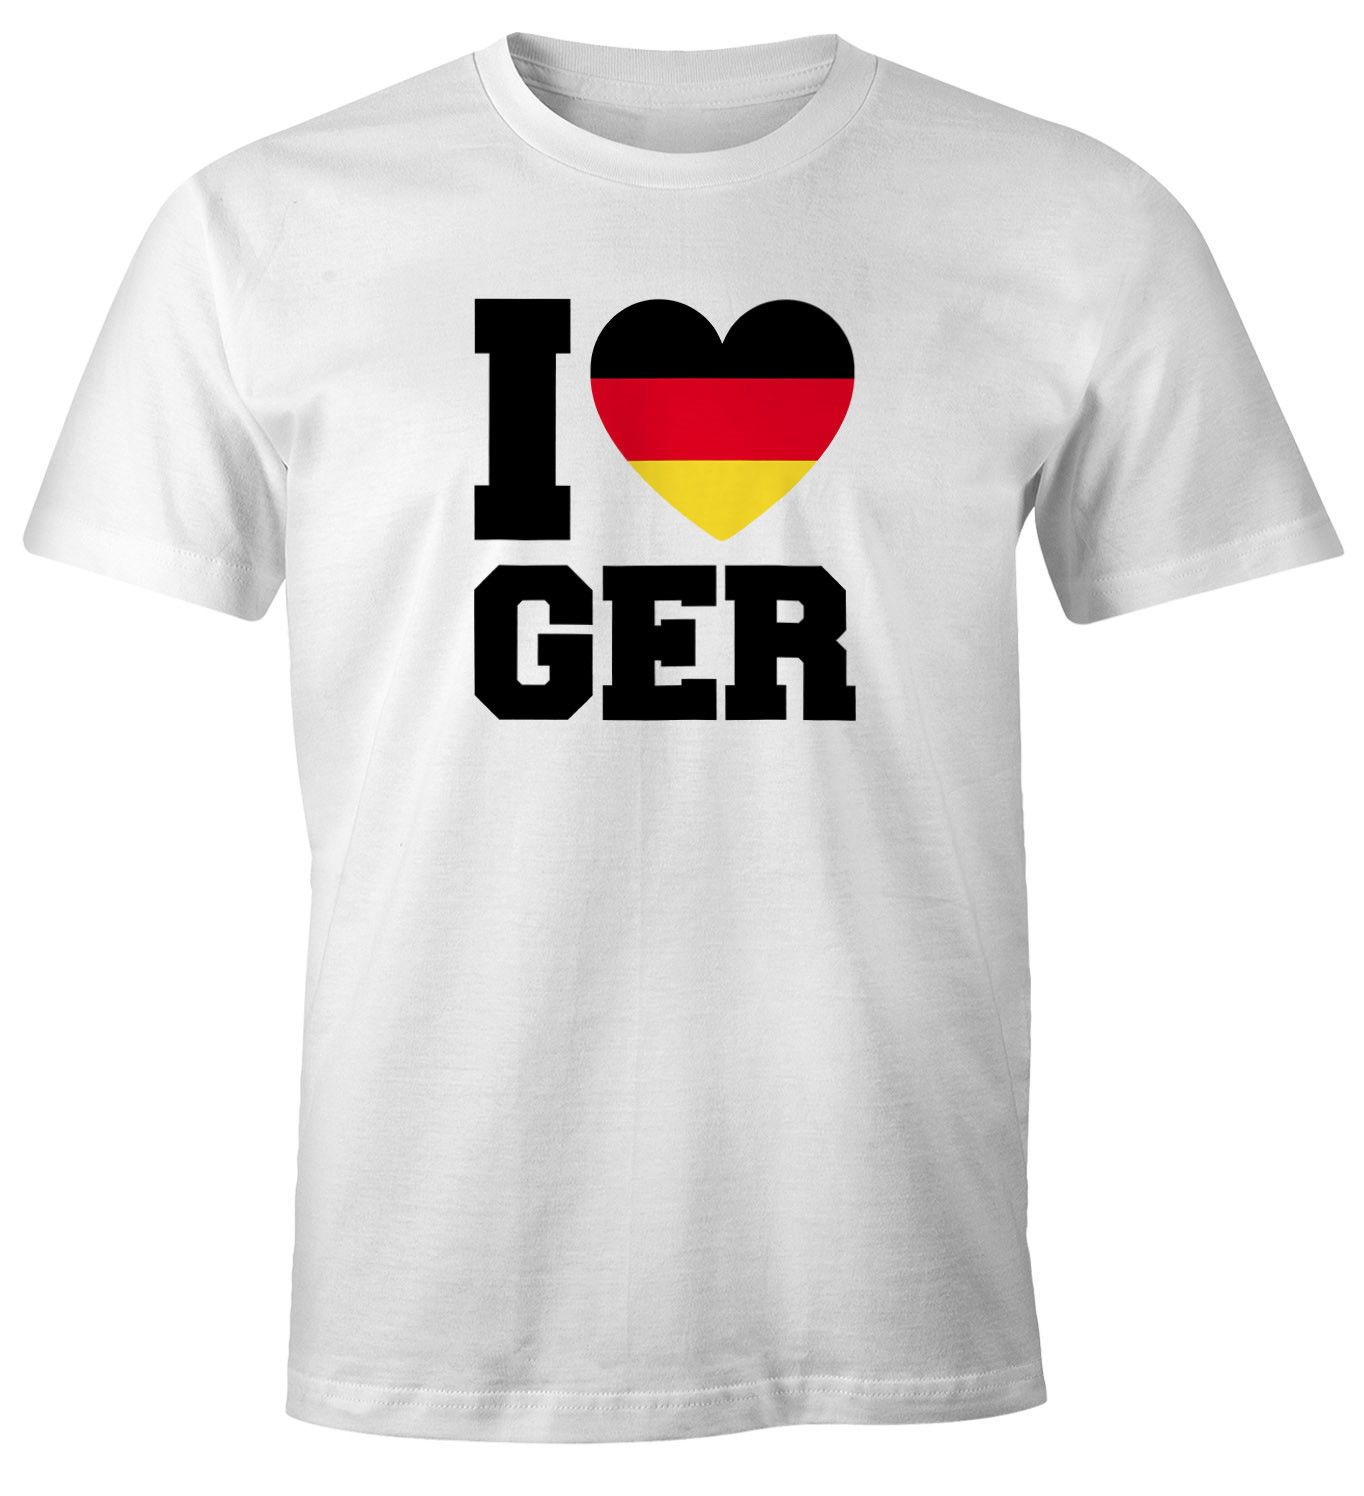 Details About Mens T Shirt I Love Germany Germany Heart Football World Cup Shirt Fanshirt Show Original Title Mens Tops Mens Fashion Cat T Shirt